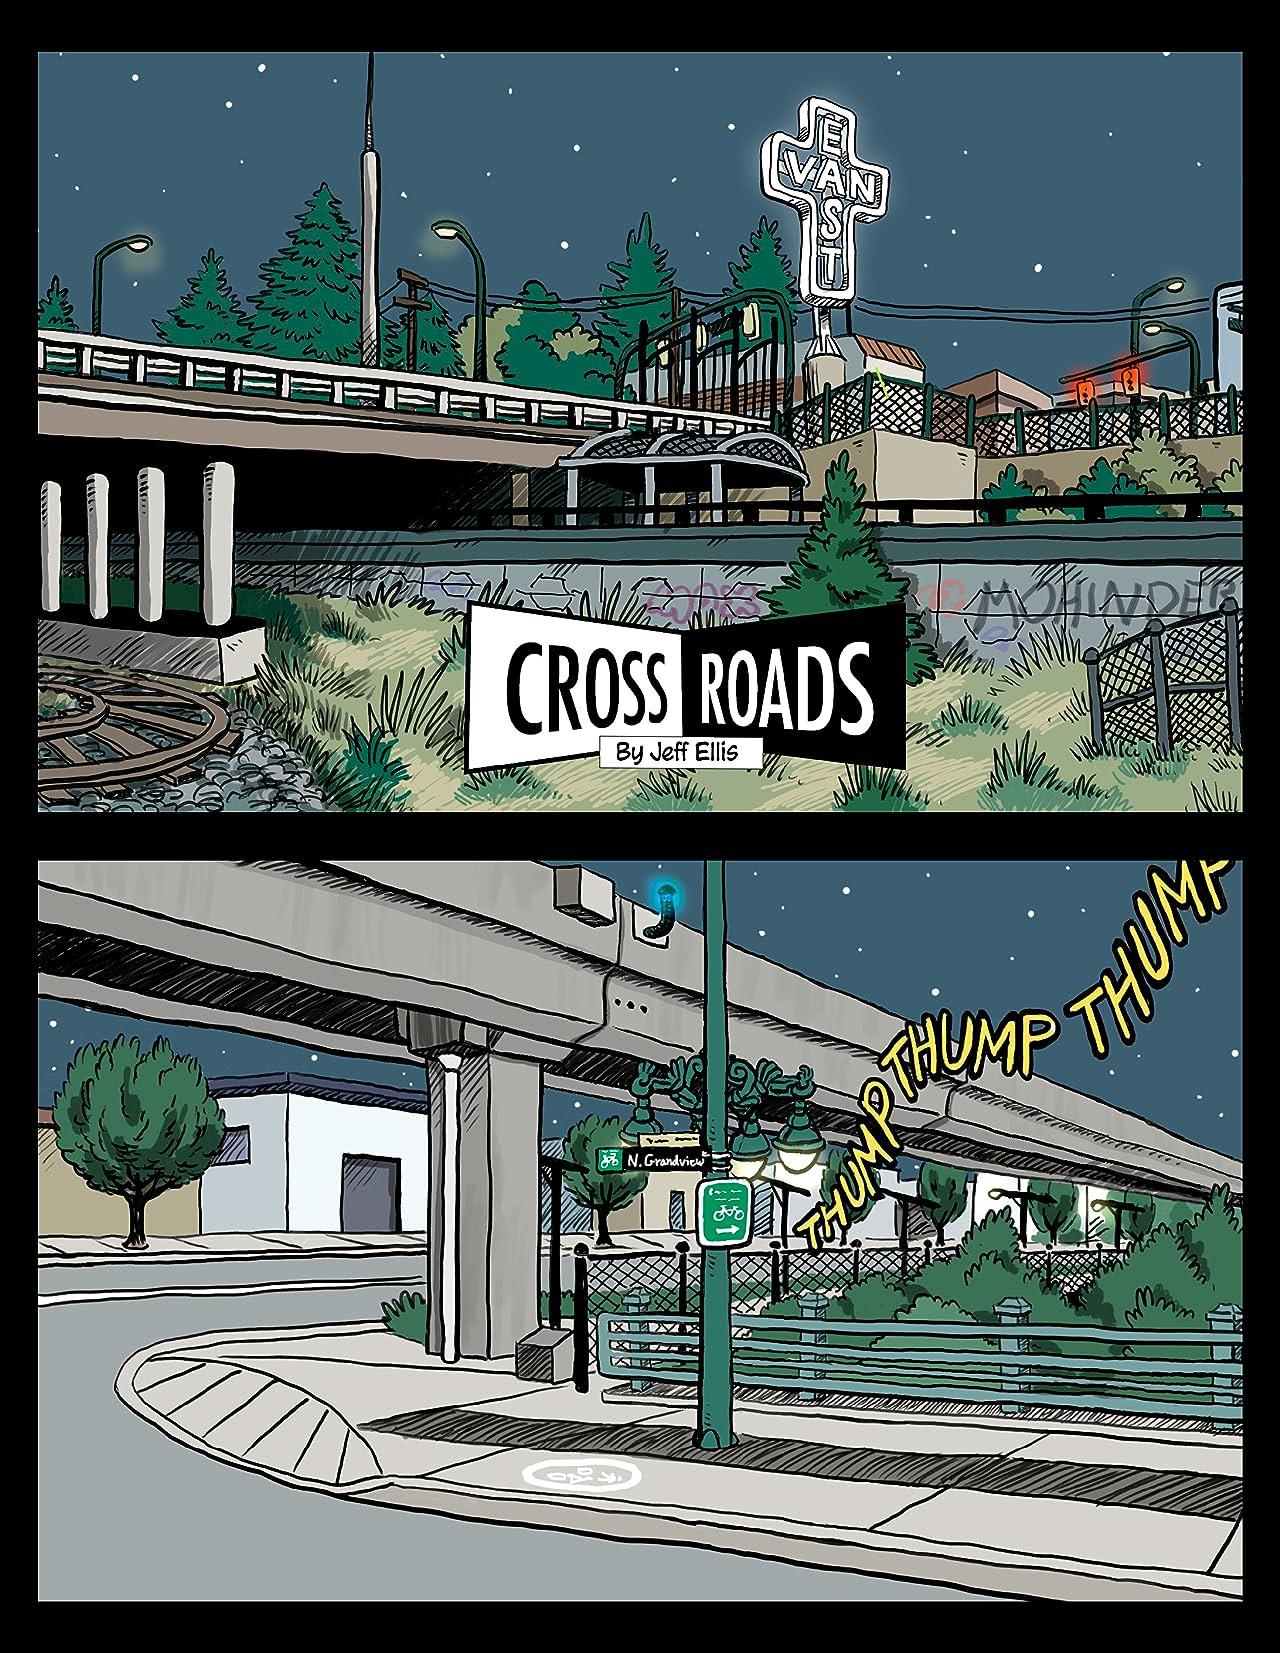 Crossroads vol 1: Redux #1